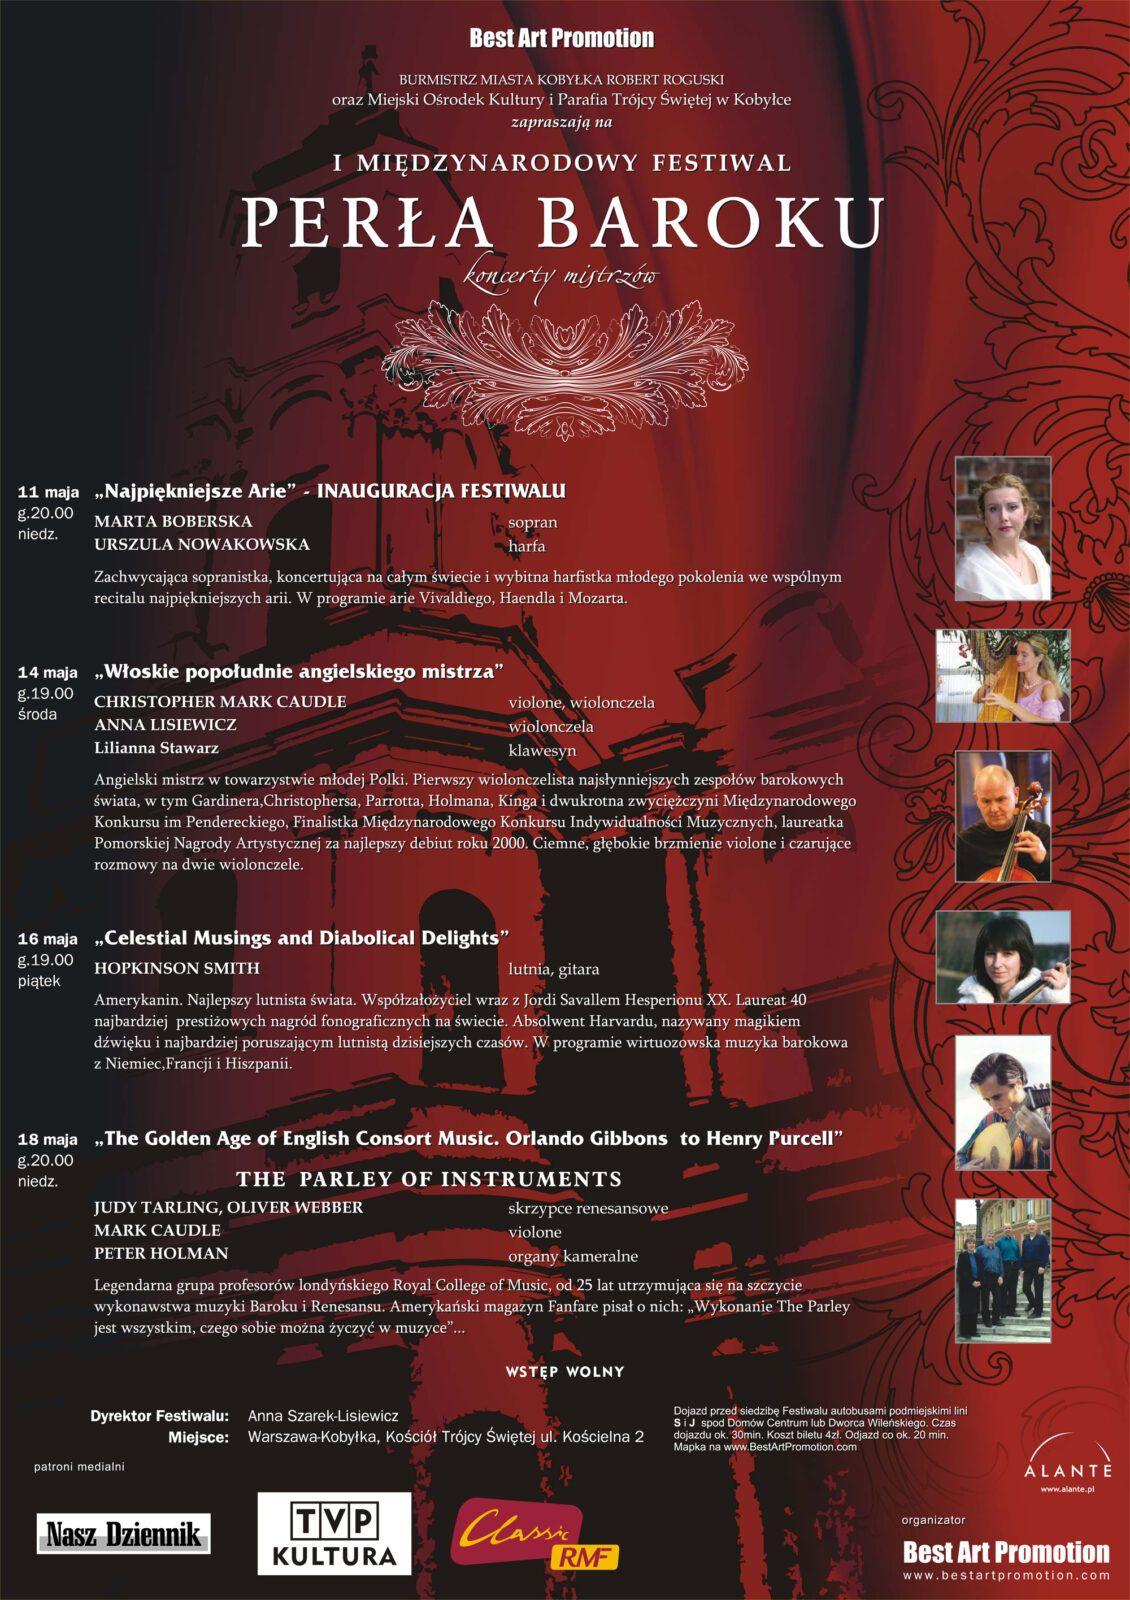 1-Festiwal-Perla-Baroku-2008